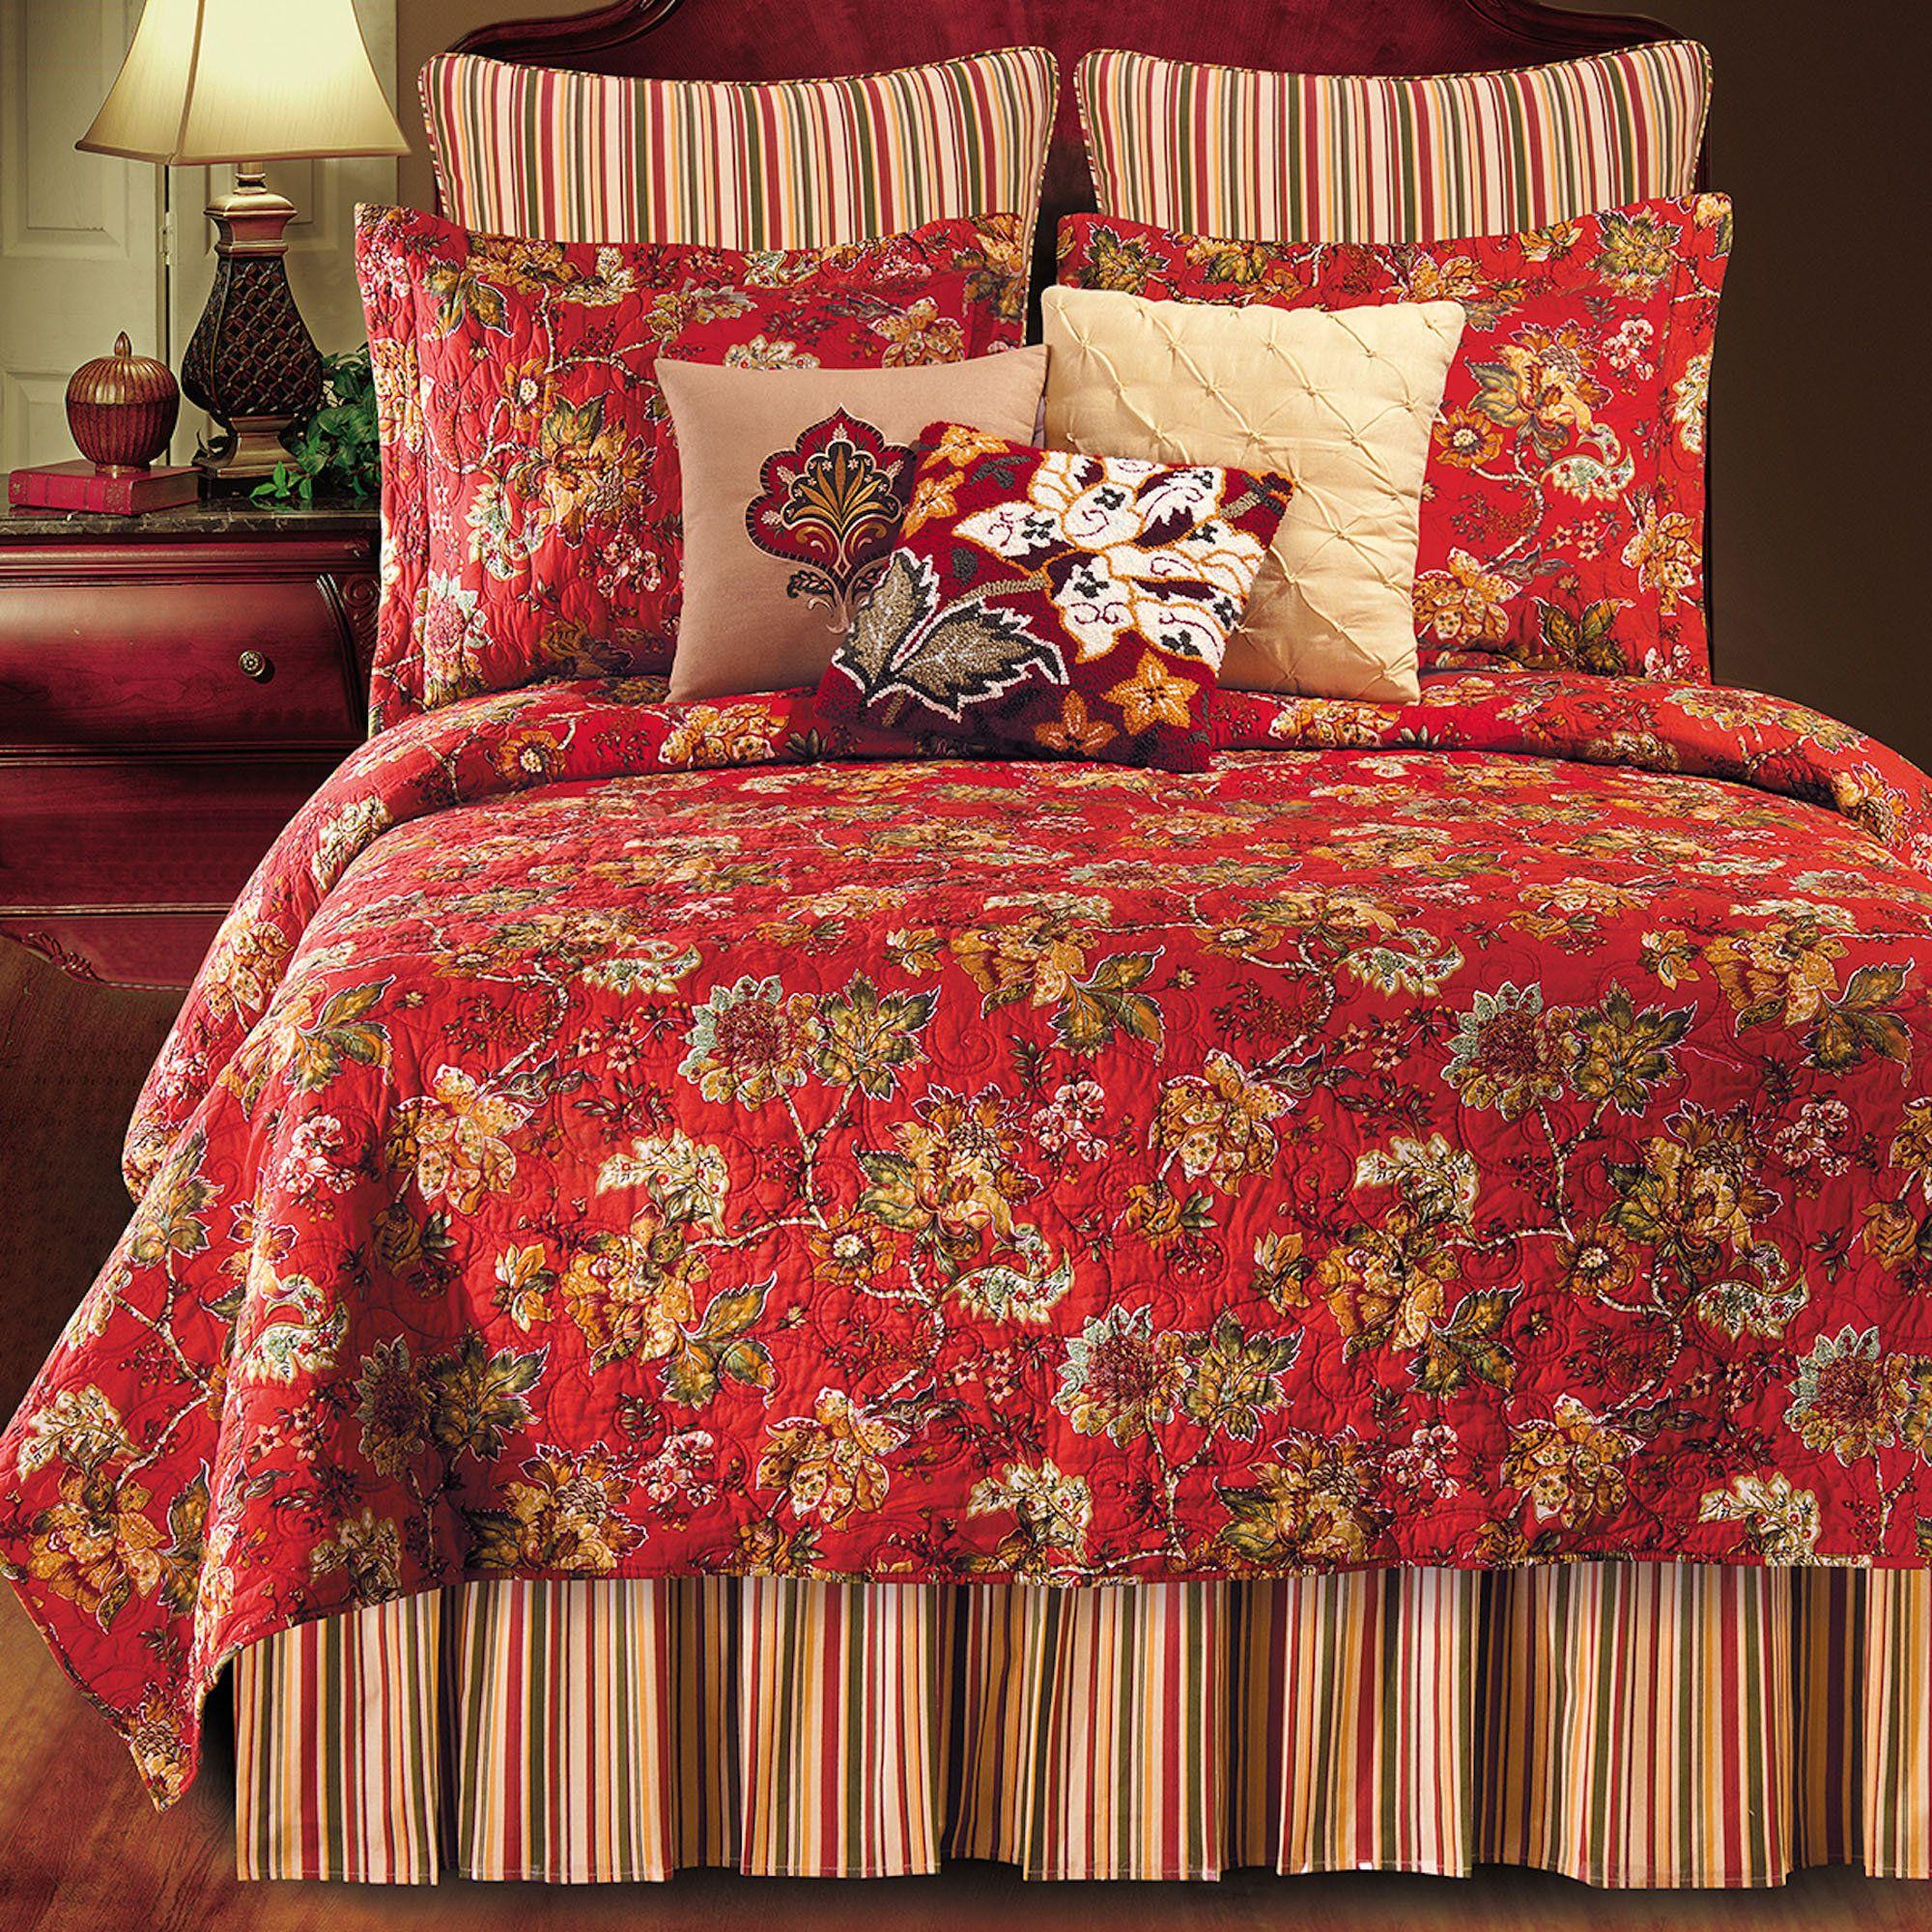 koh bedding duvet linens cover product deep set quilt range red fancy